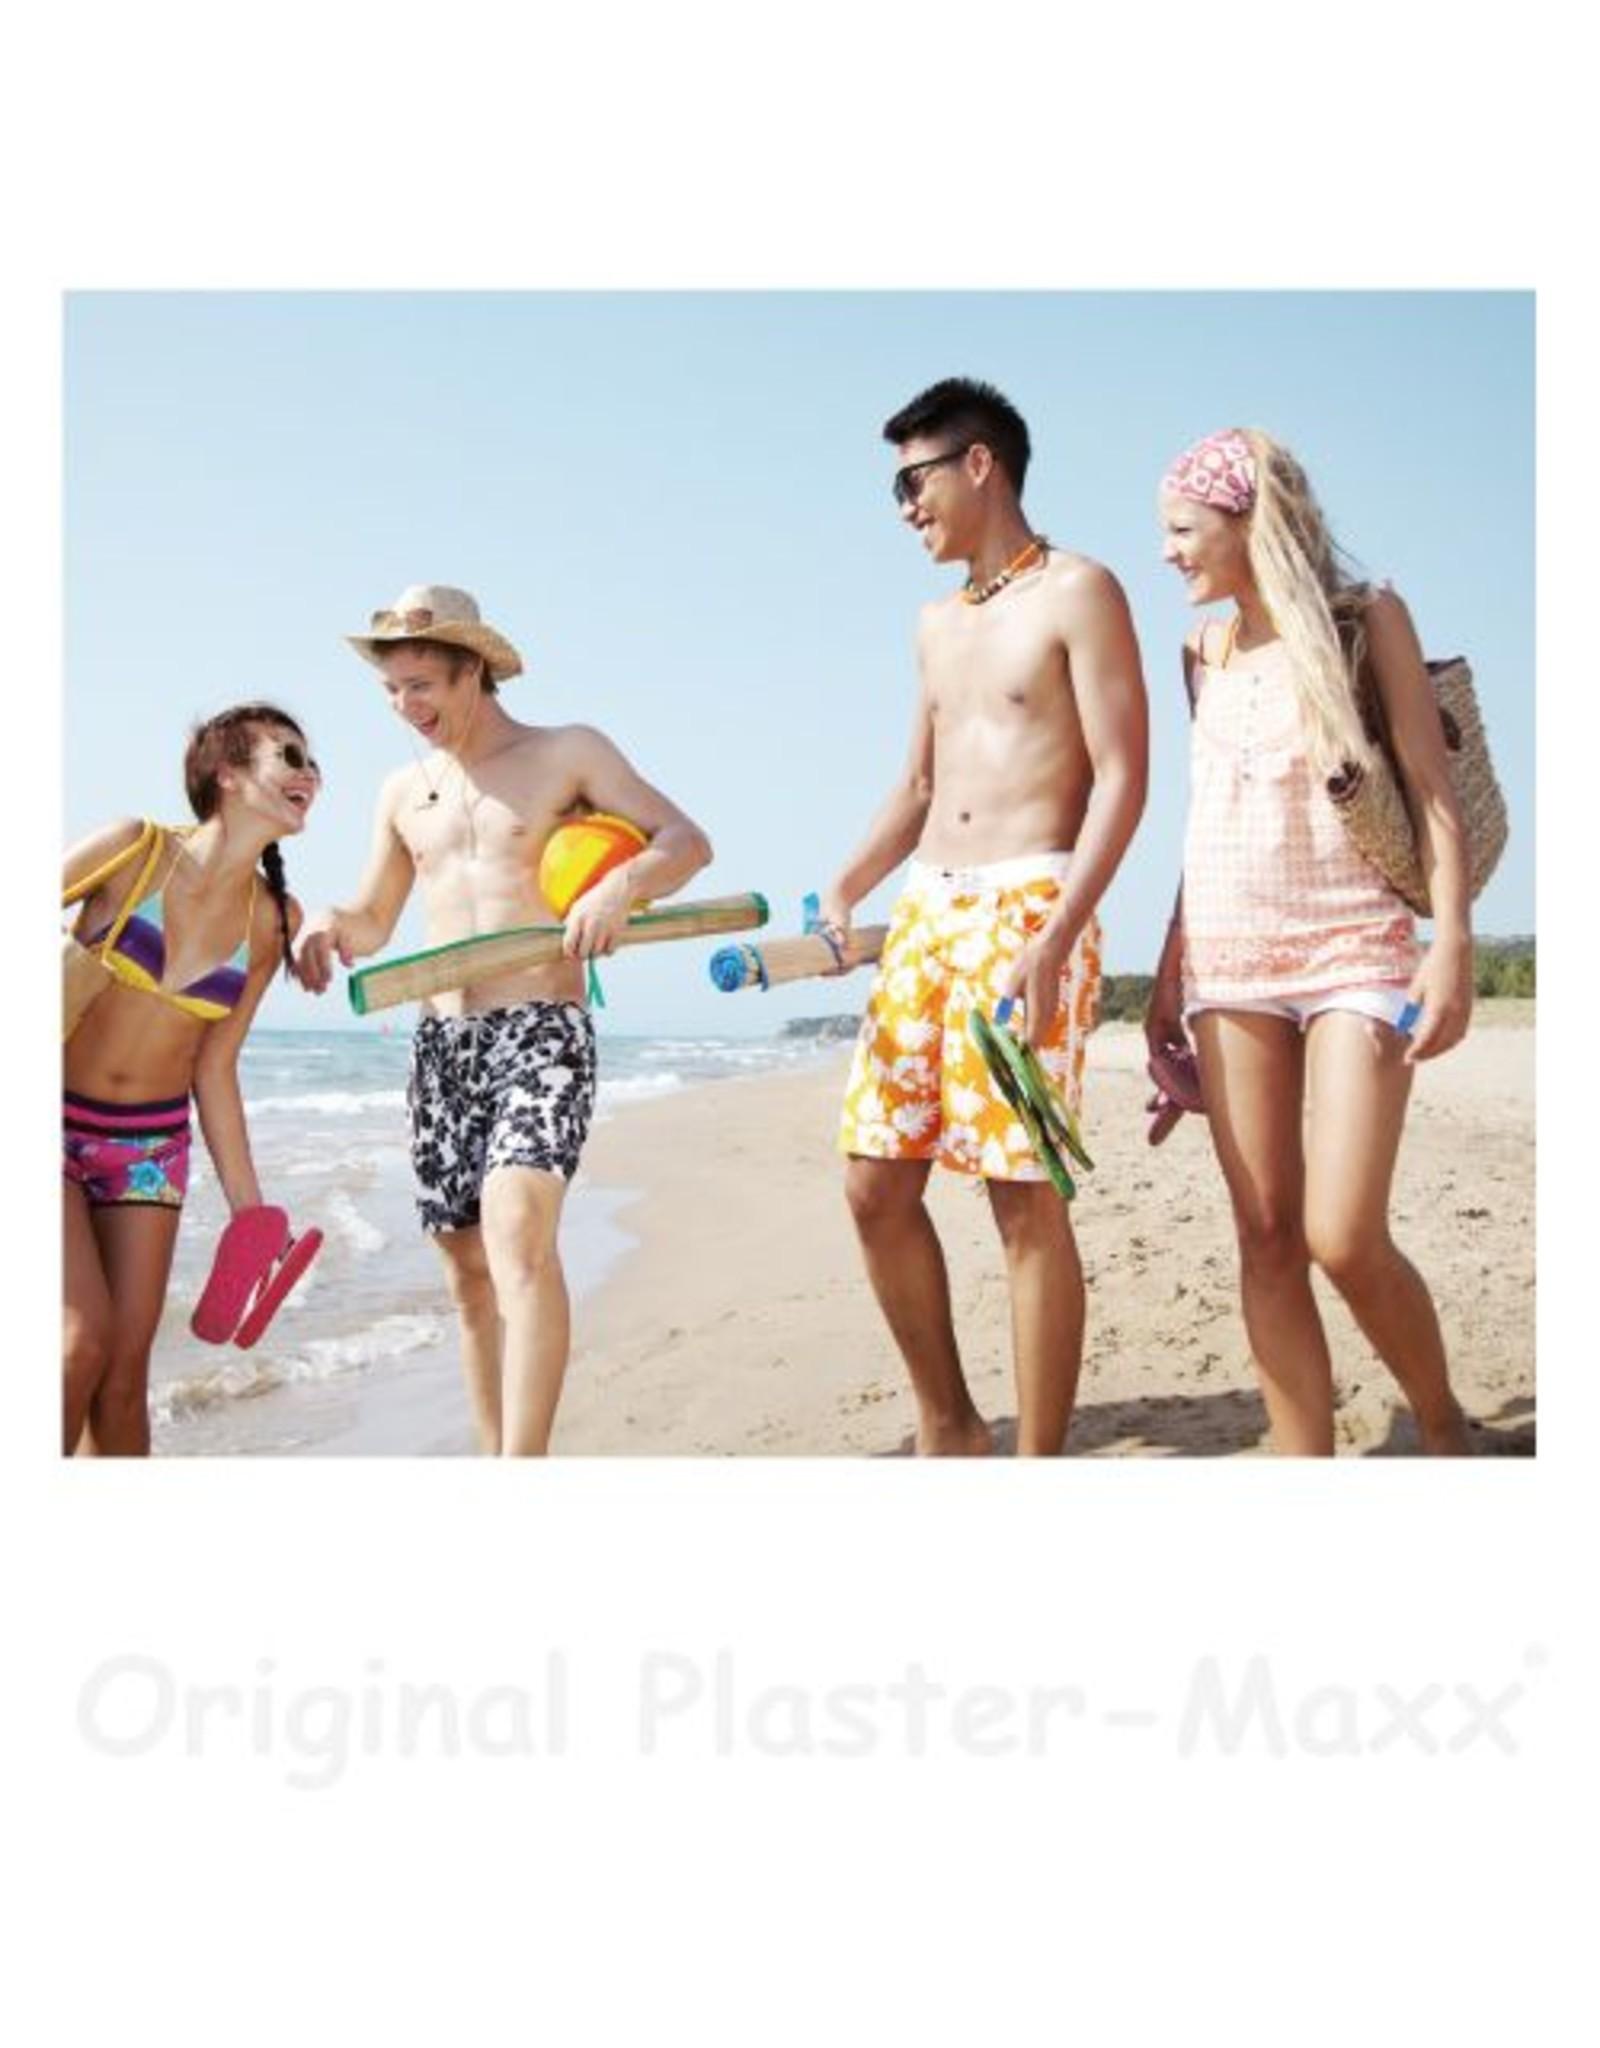 Plaster-Maxx XL Plaster-Maxx - Sparset 3xHaut 5cm